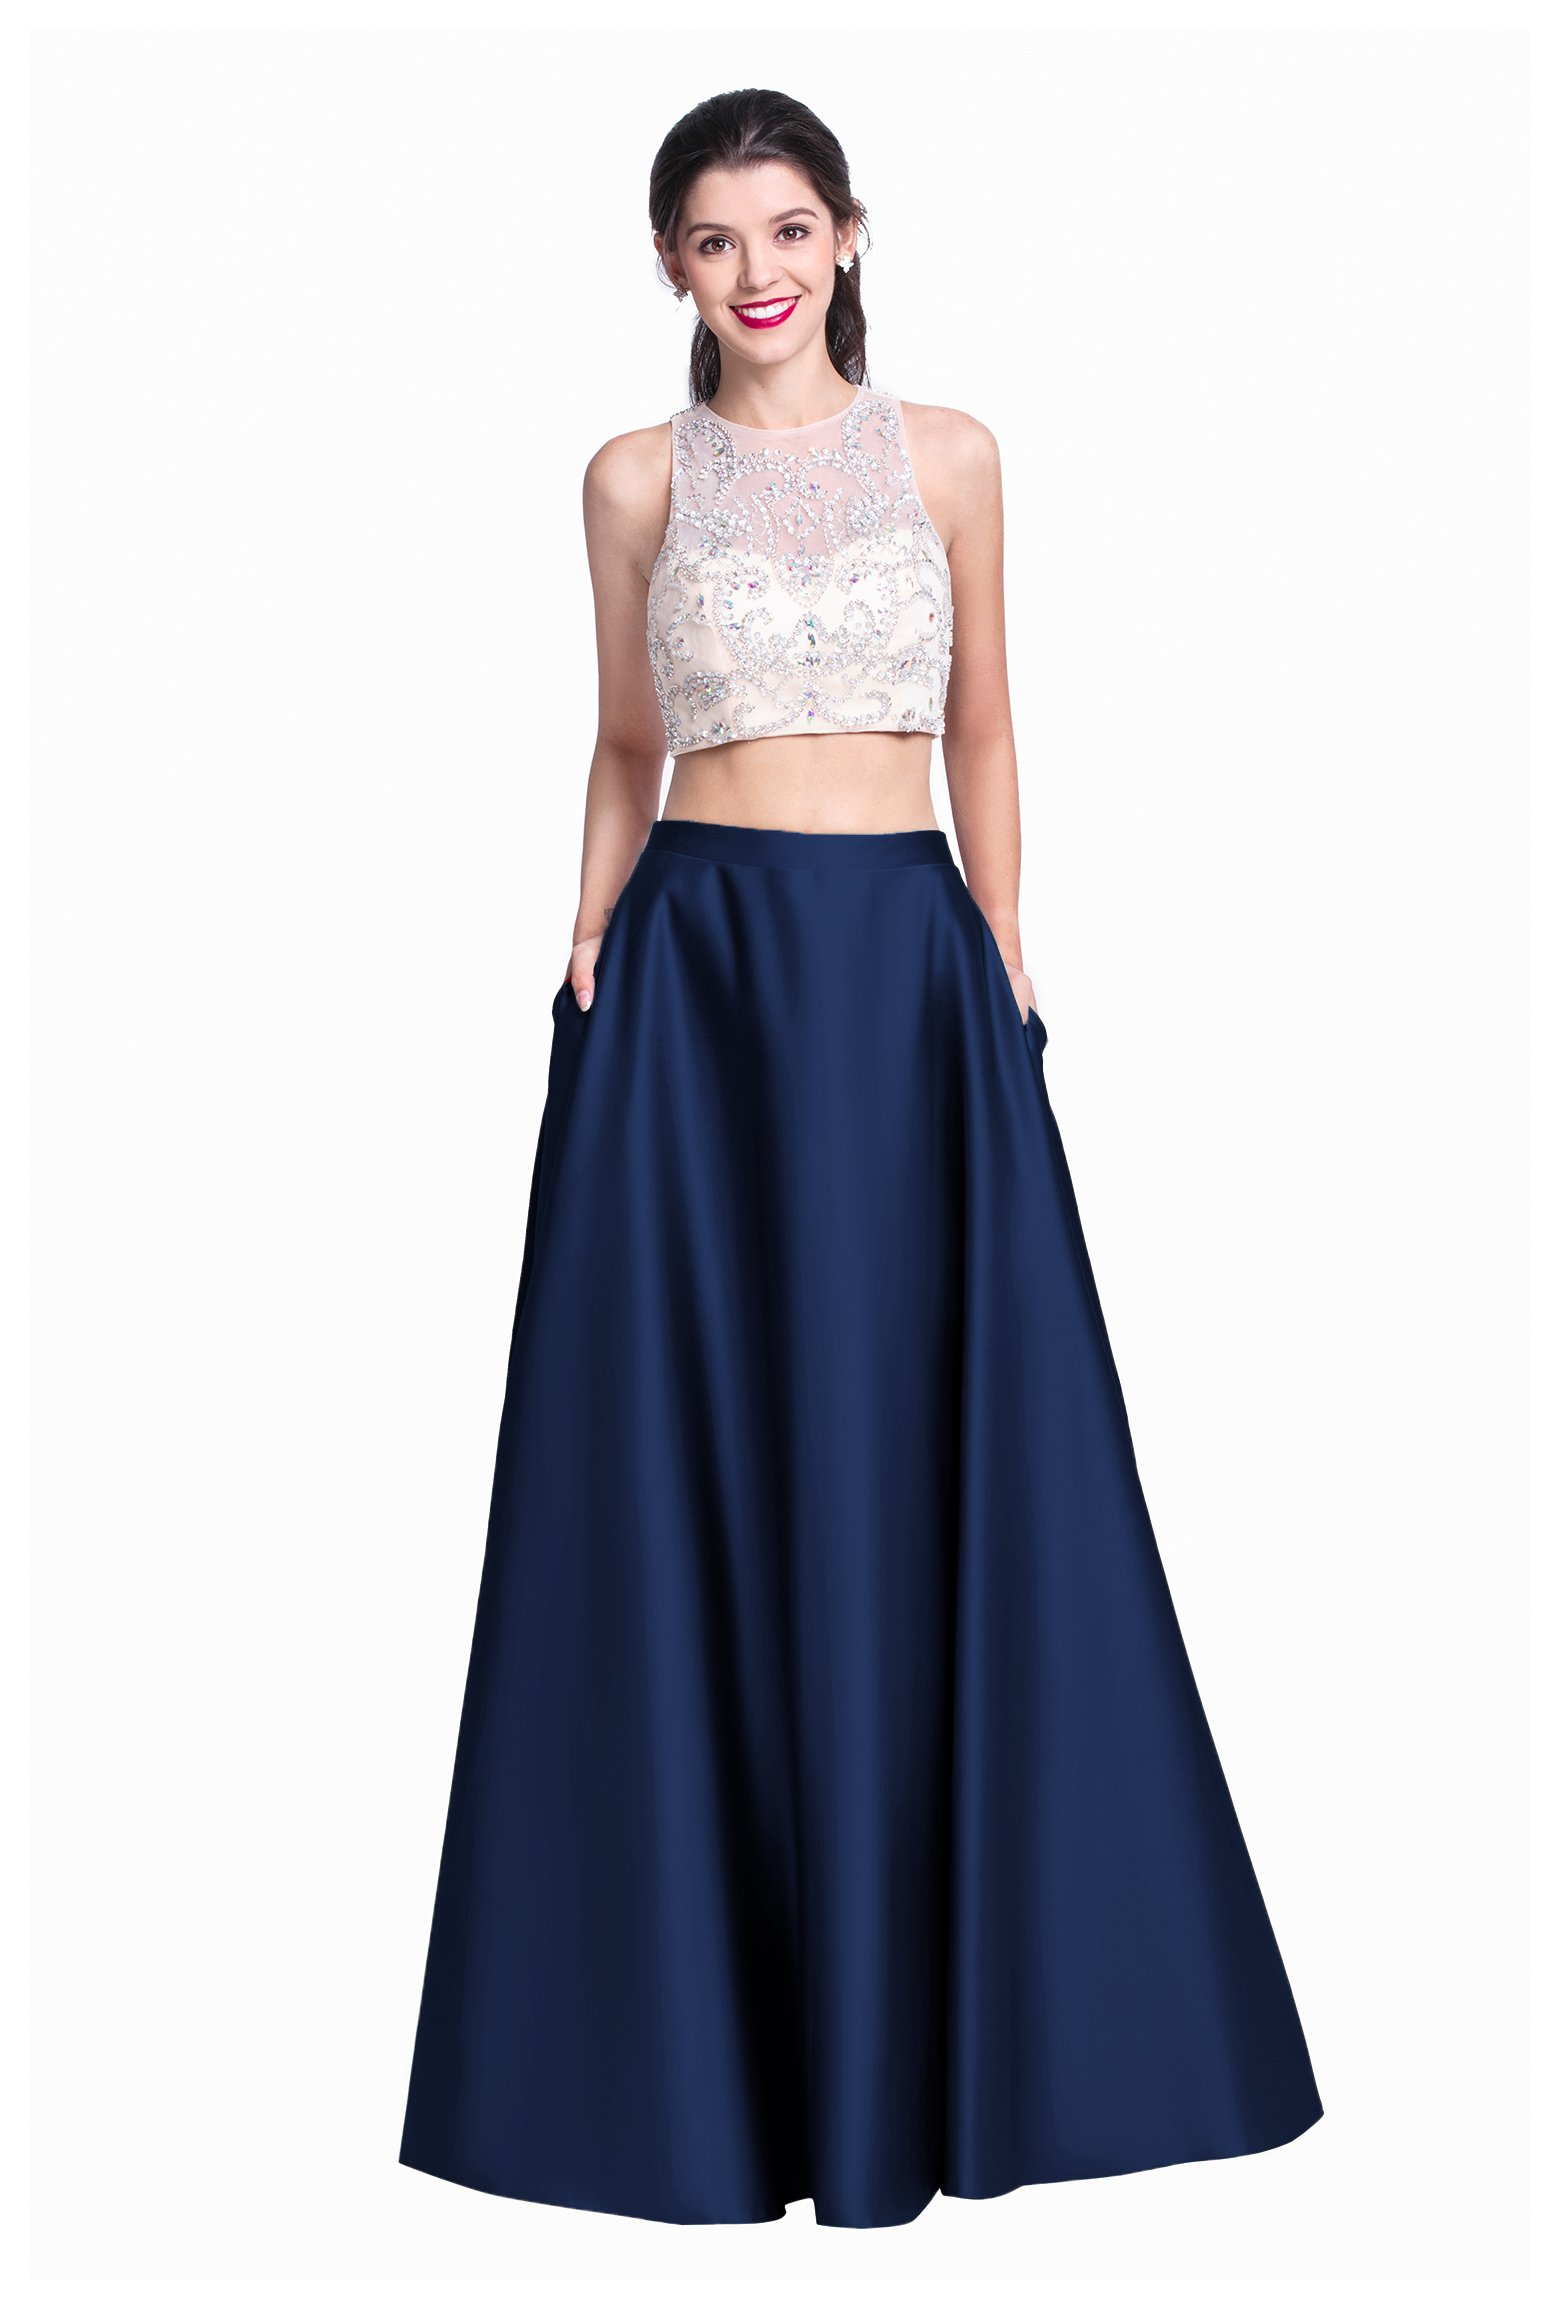 2 Piece Navy Blue Prom Dress: Amazon.com